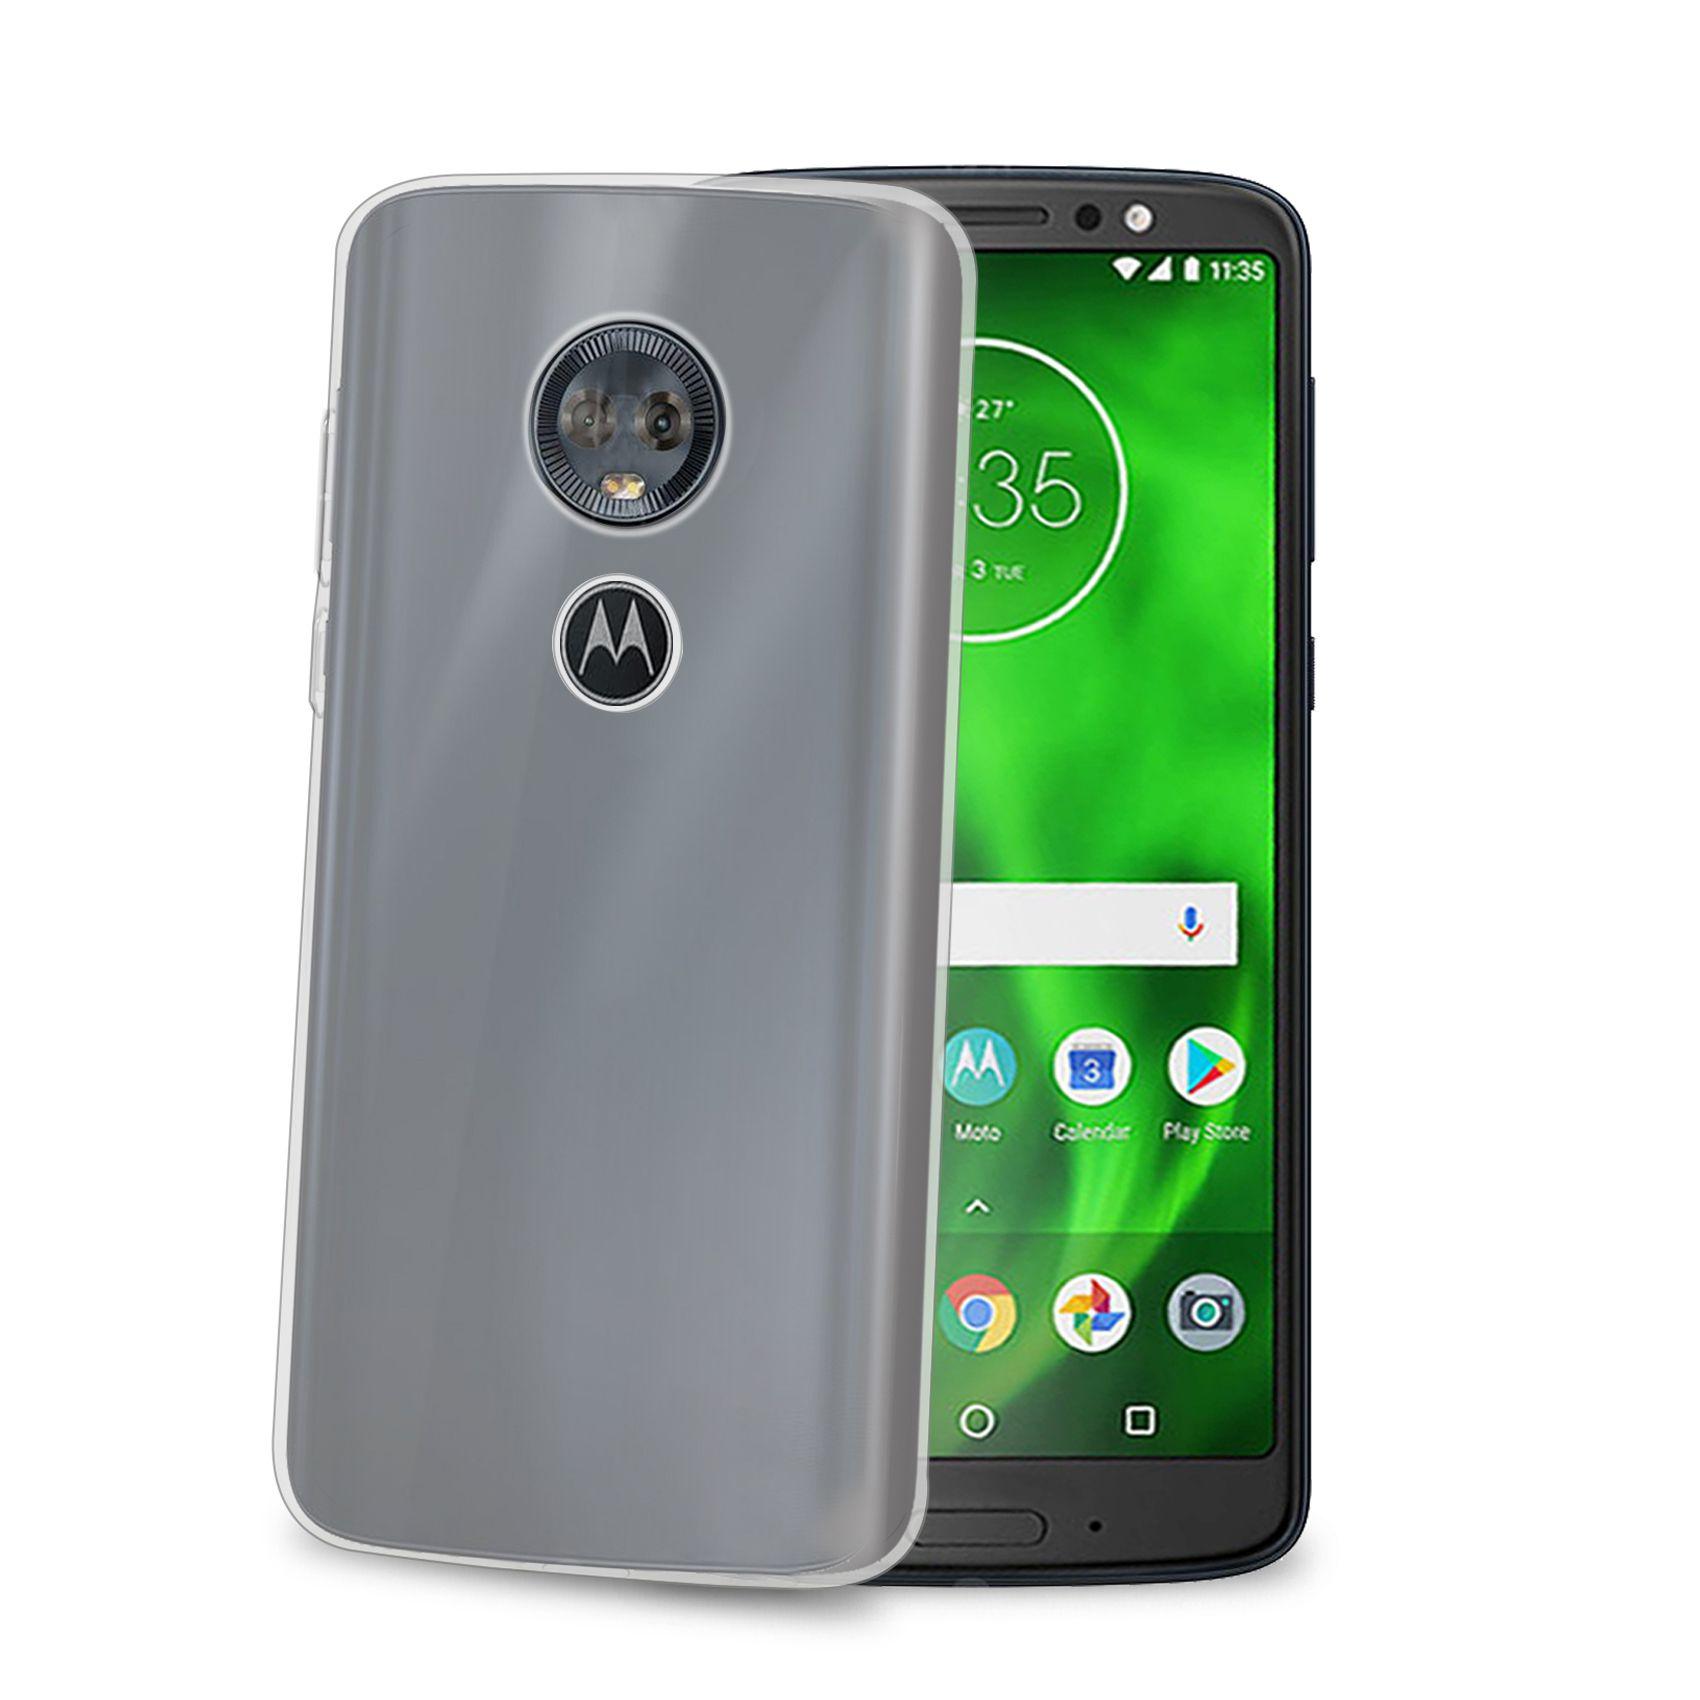 TPU pouzdro CELLY Gelskin pro Motorola Moto G6 Play, bezbarvé